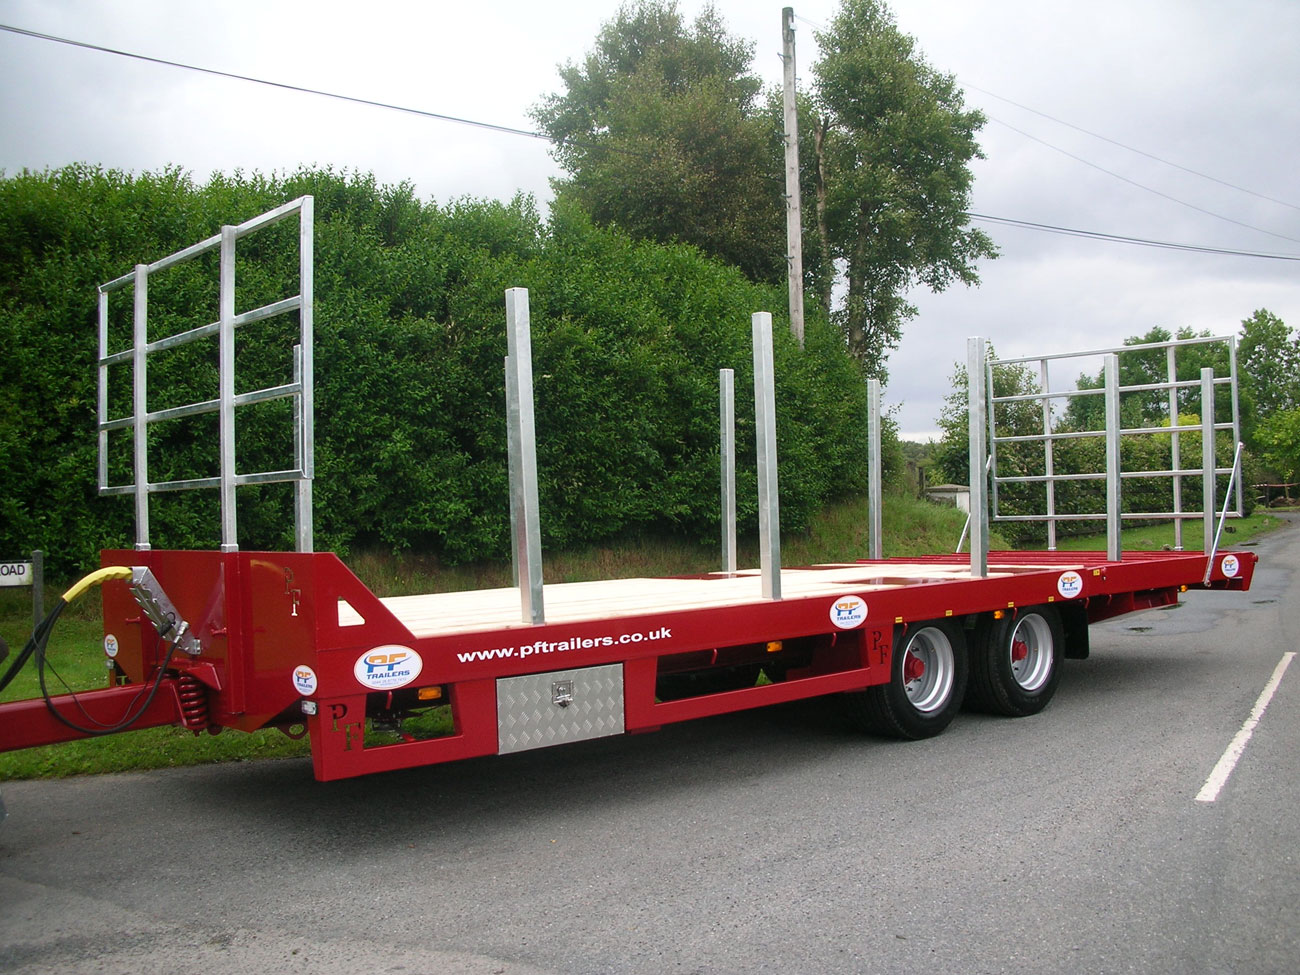 19T Hydraulic Beavertail Trailer